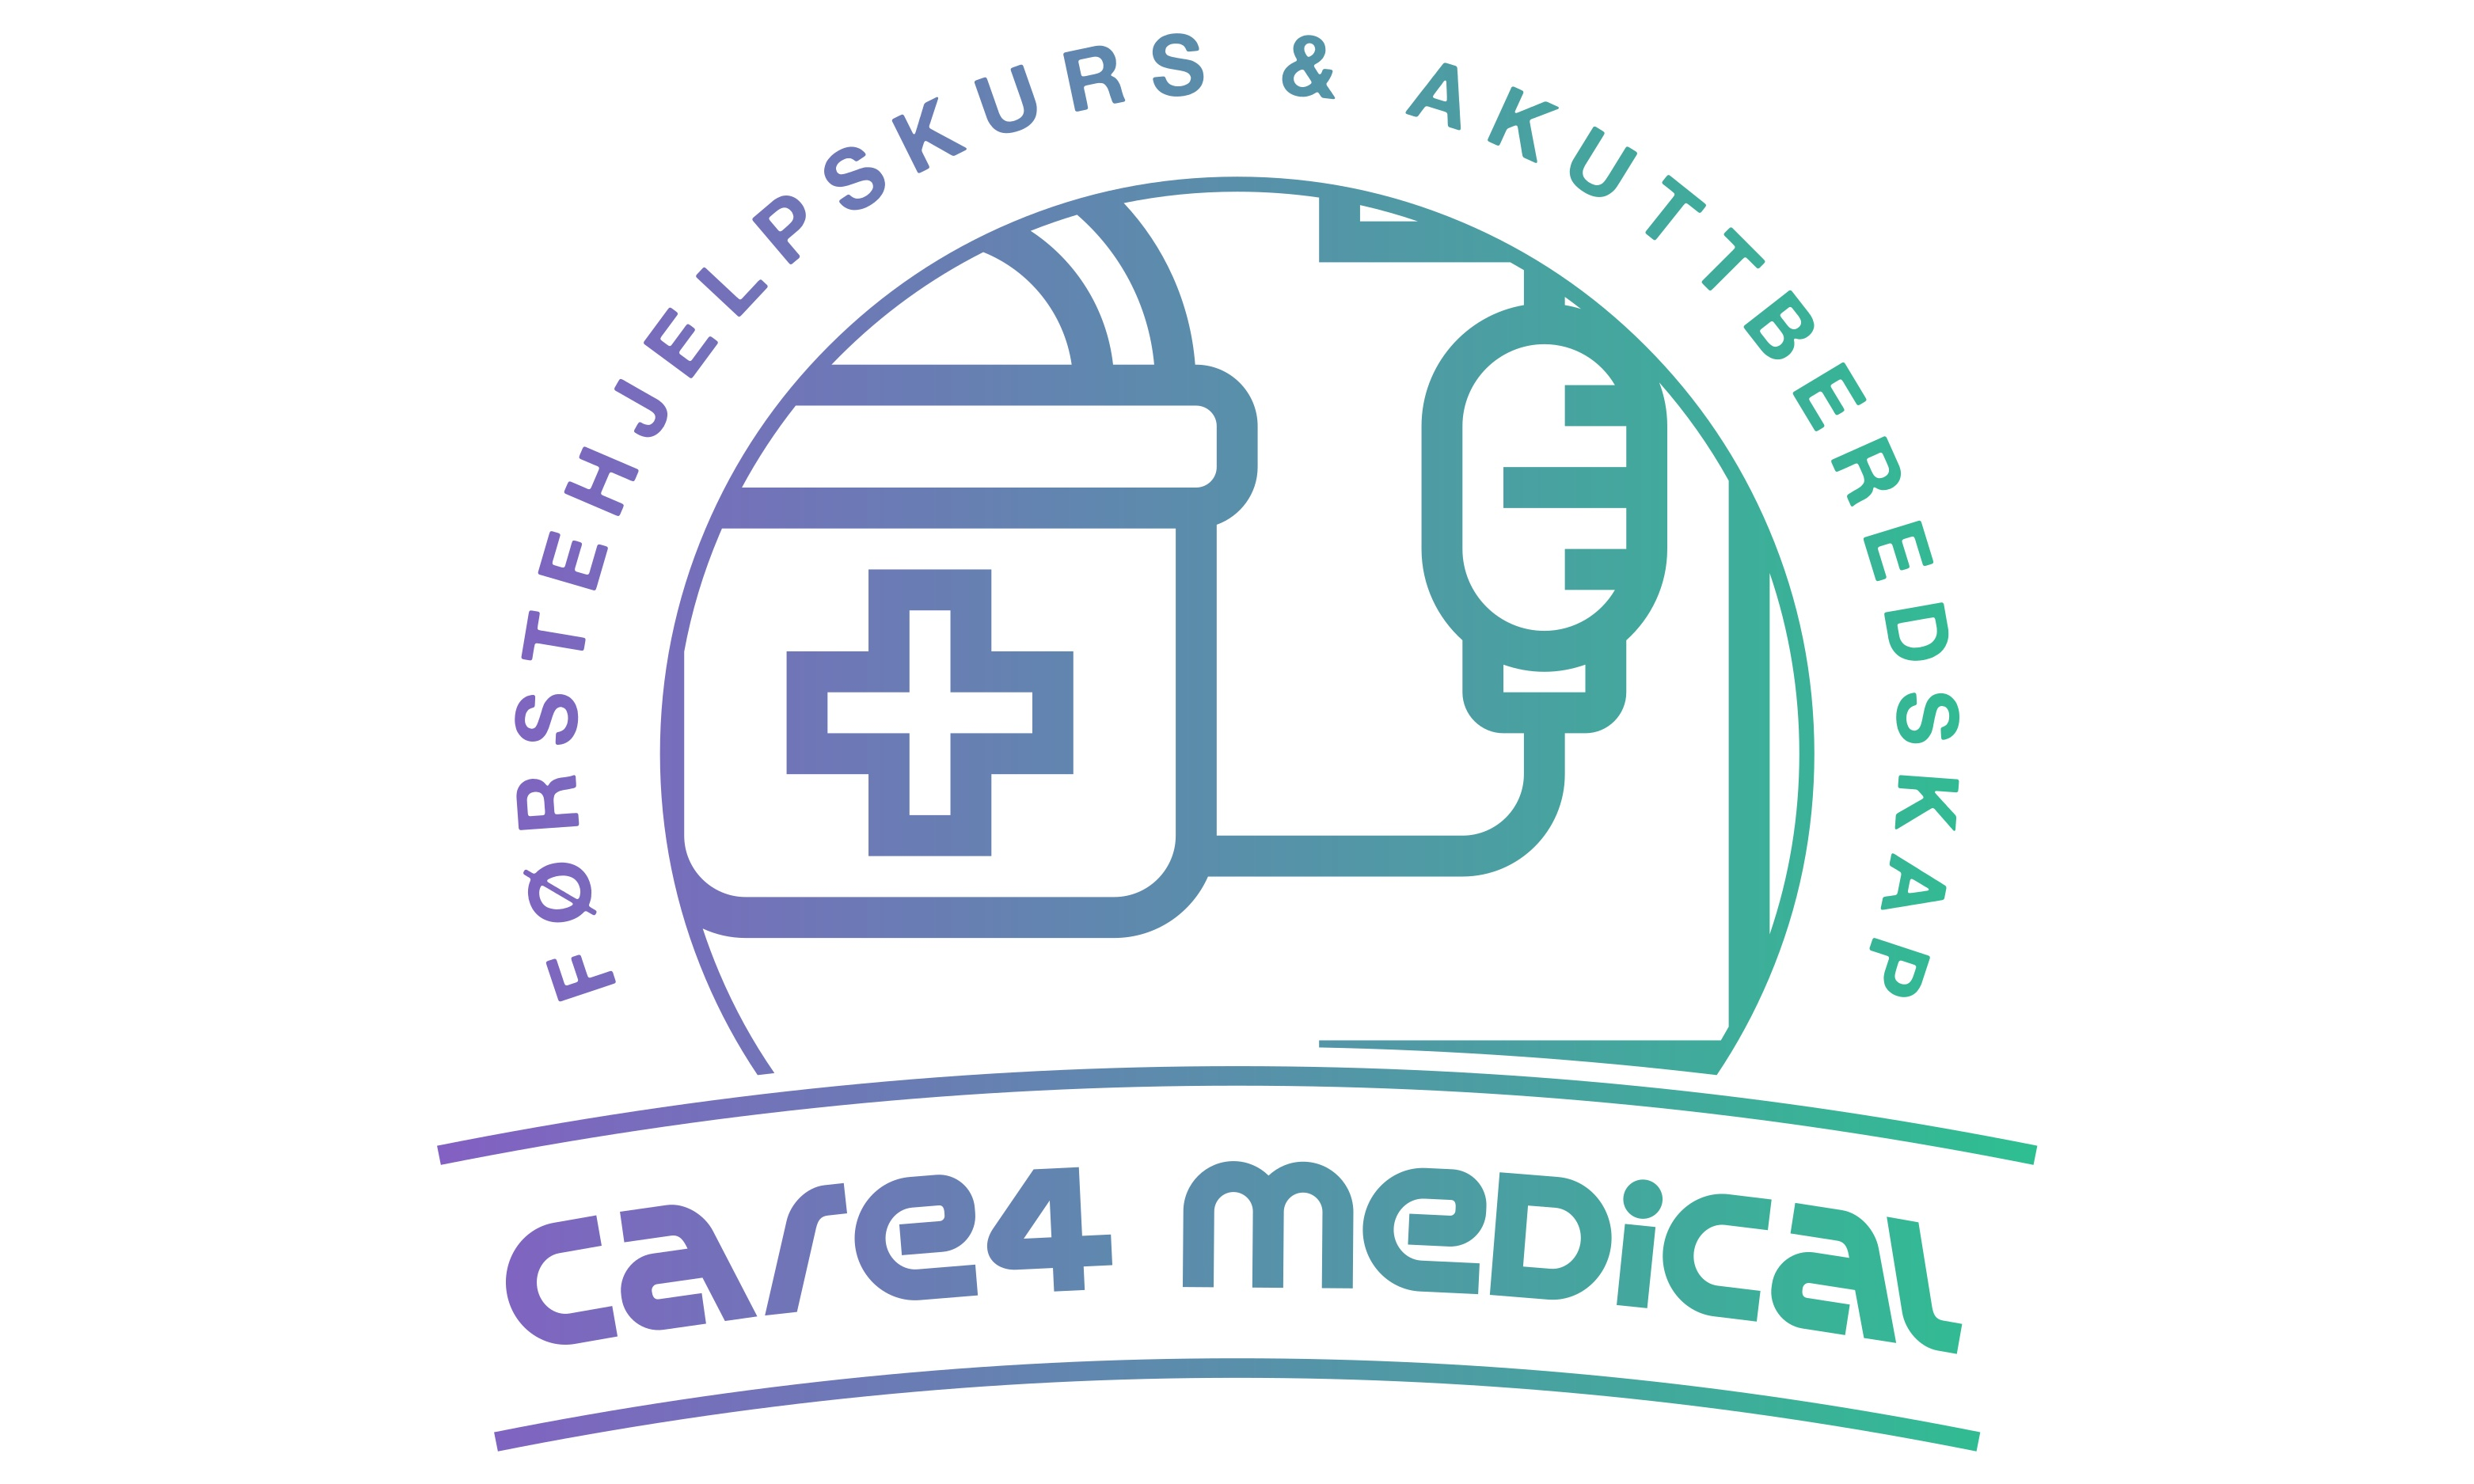 Care4medical